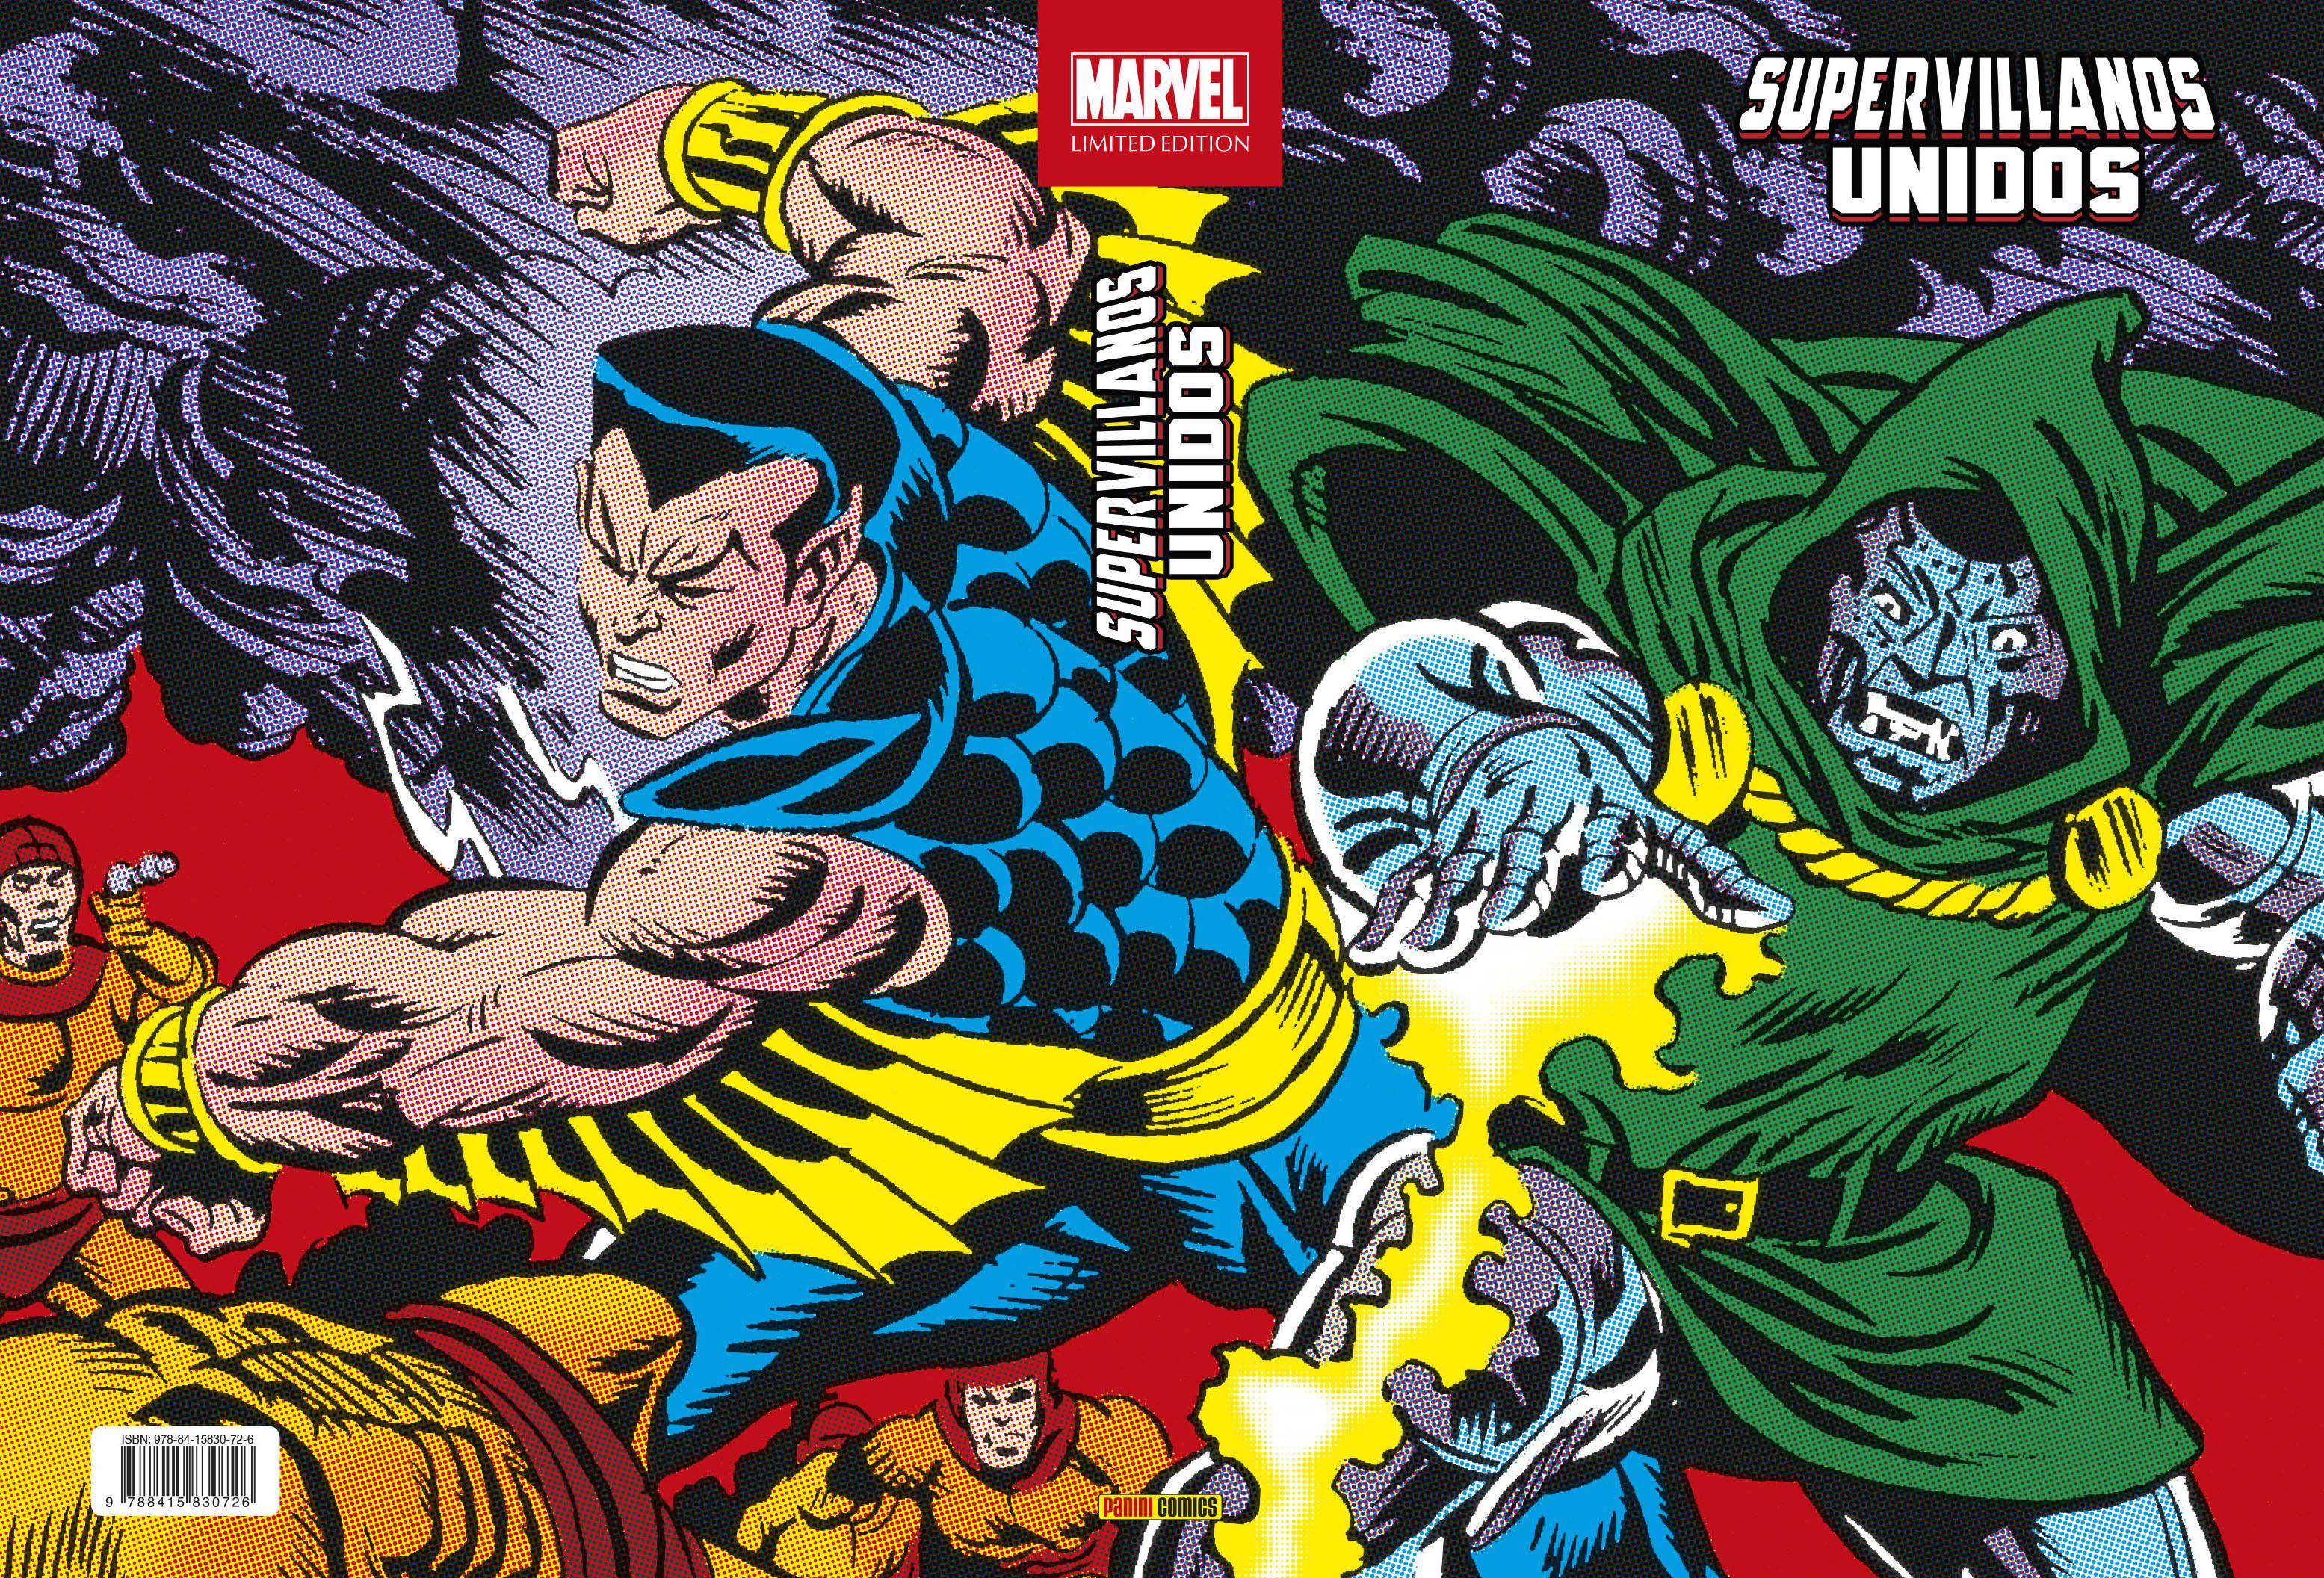 Marvel Limited Edition. Supervillanos Unidos